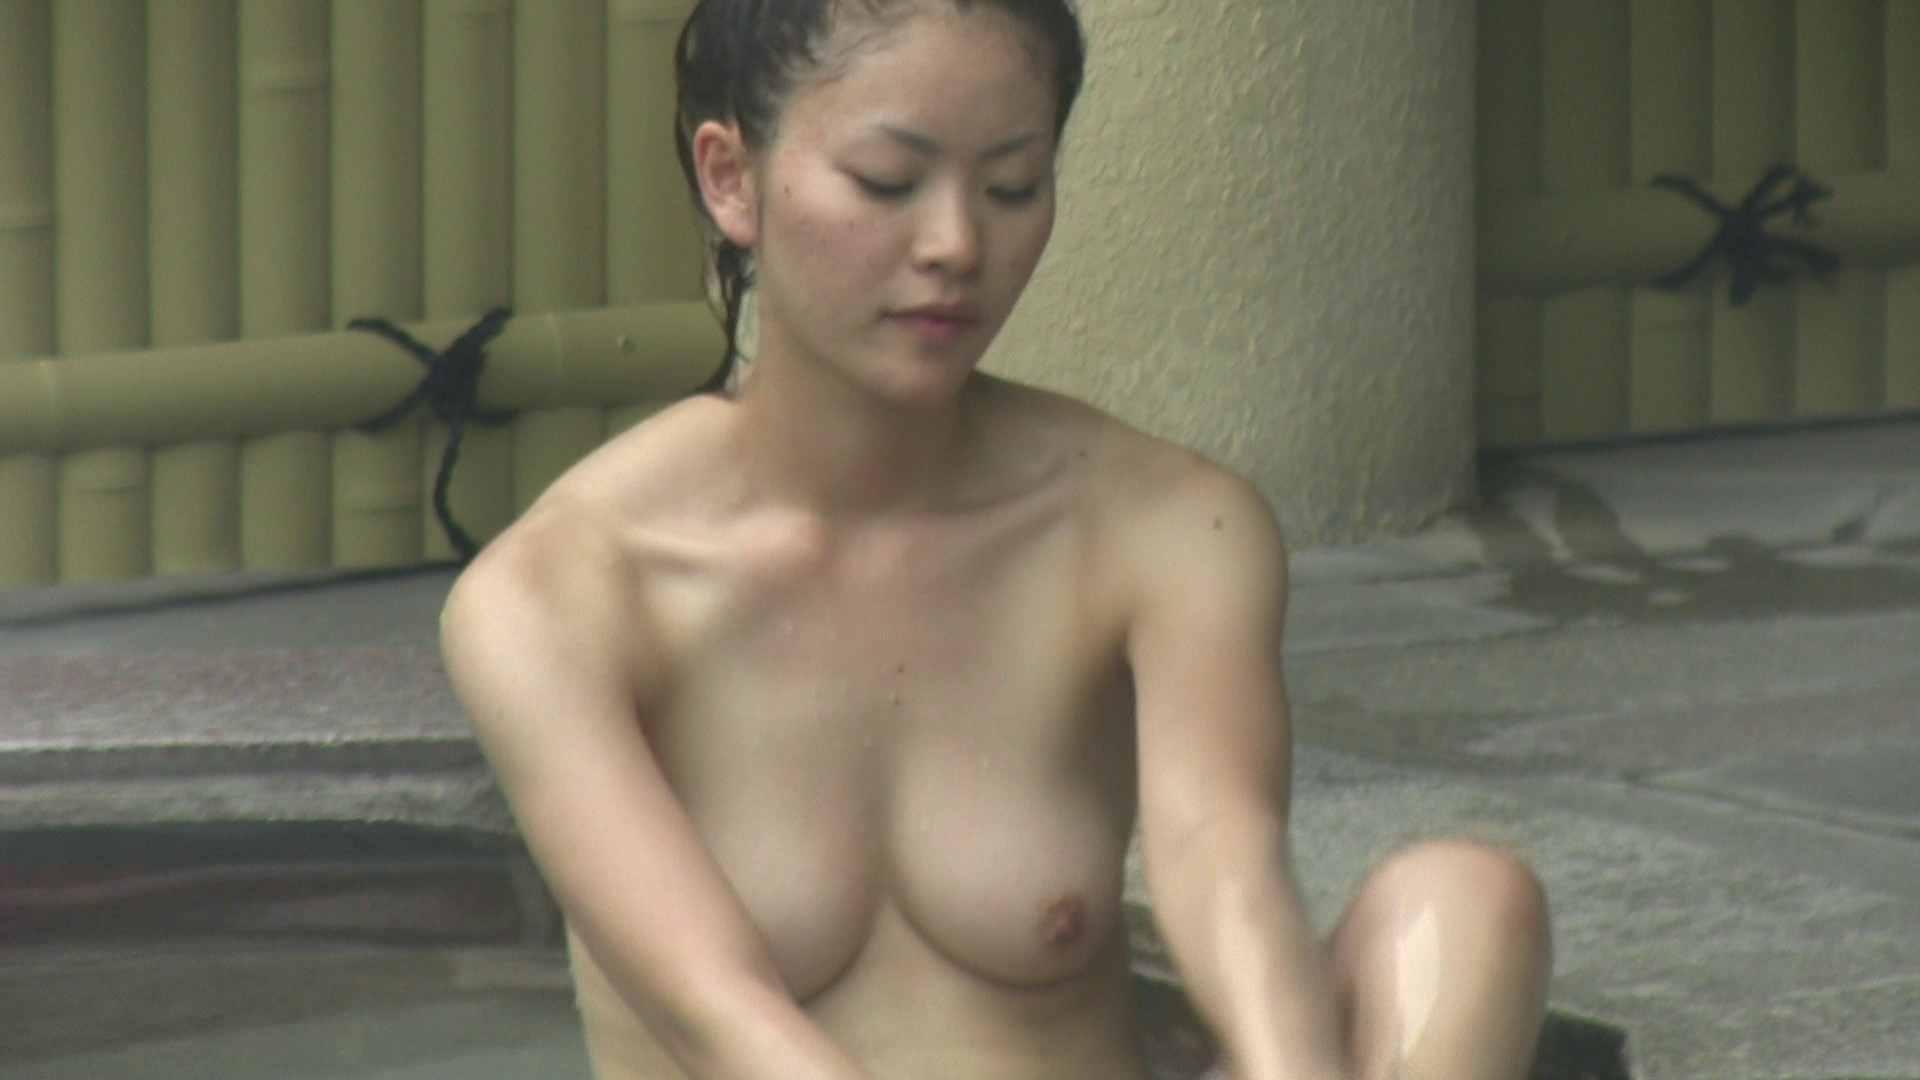 Aquaな露天風呂Vol.137 エッチな盗撮 オメコ無修正動画無料 92pic 47